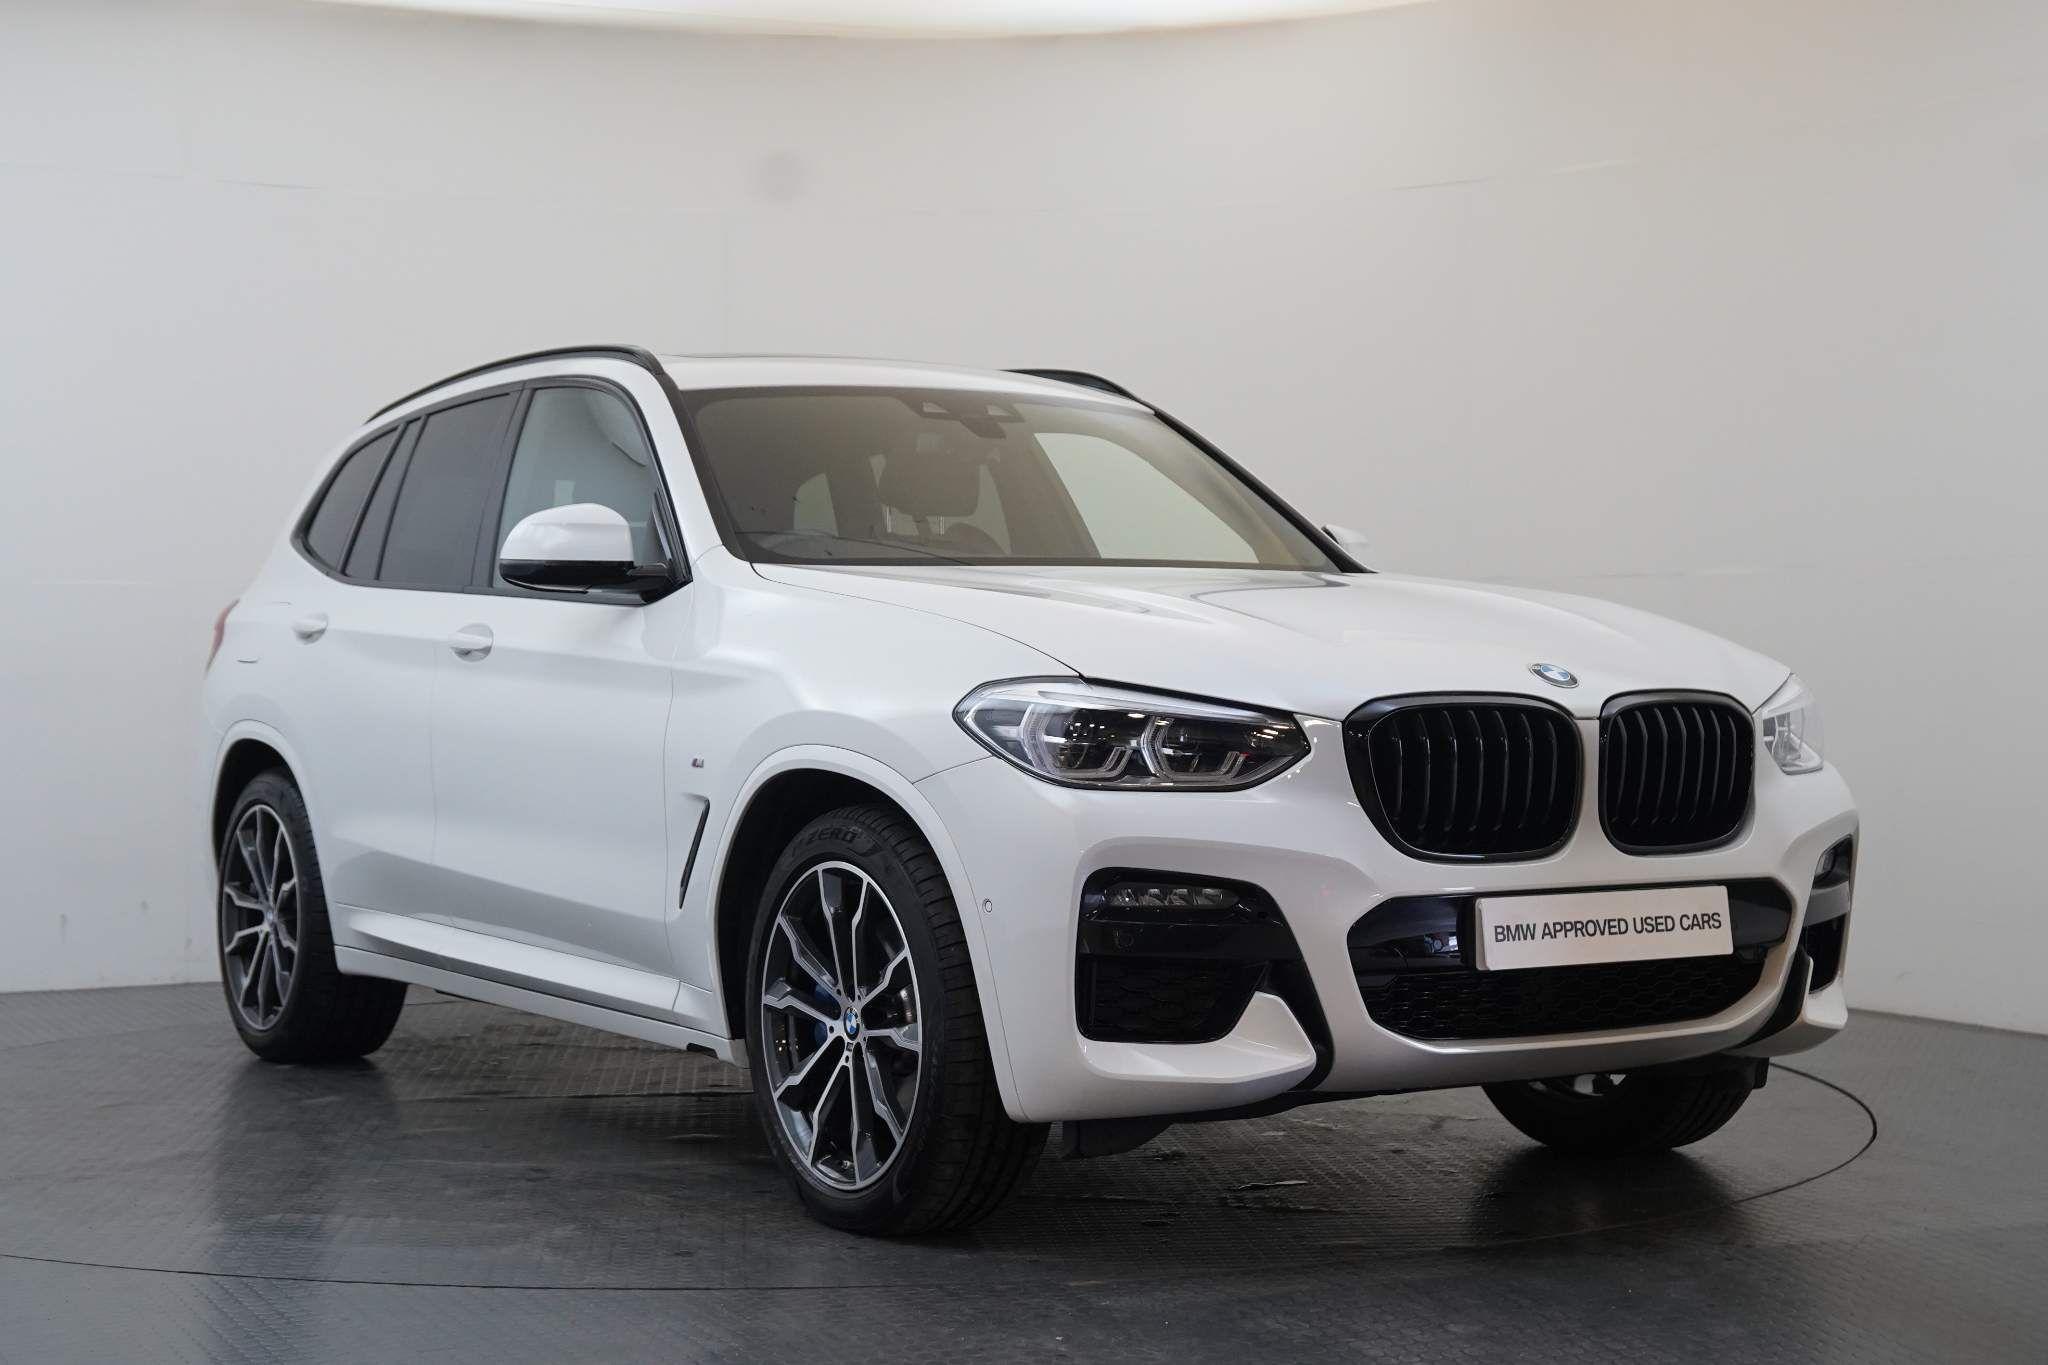 BMW X3 Series